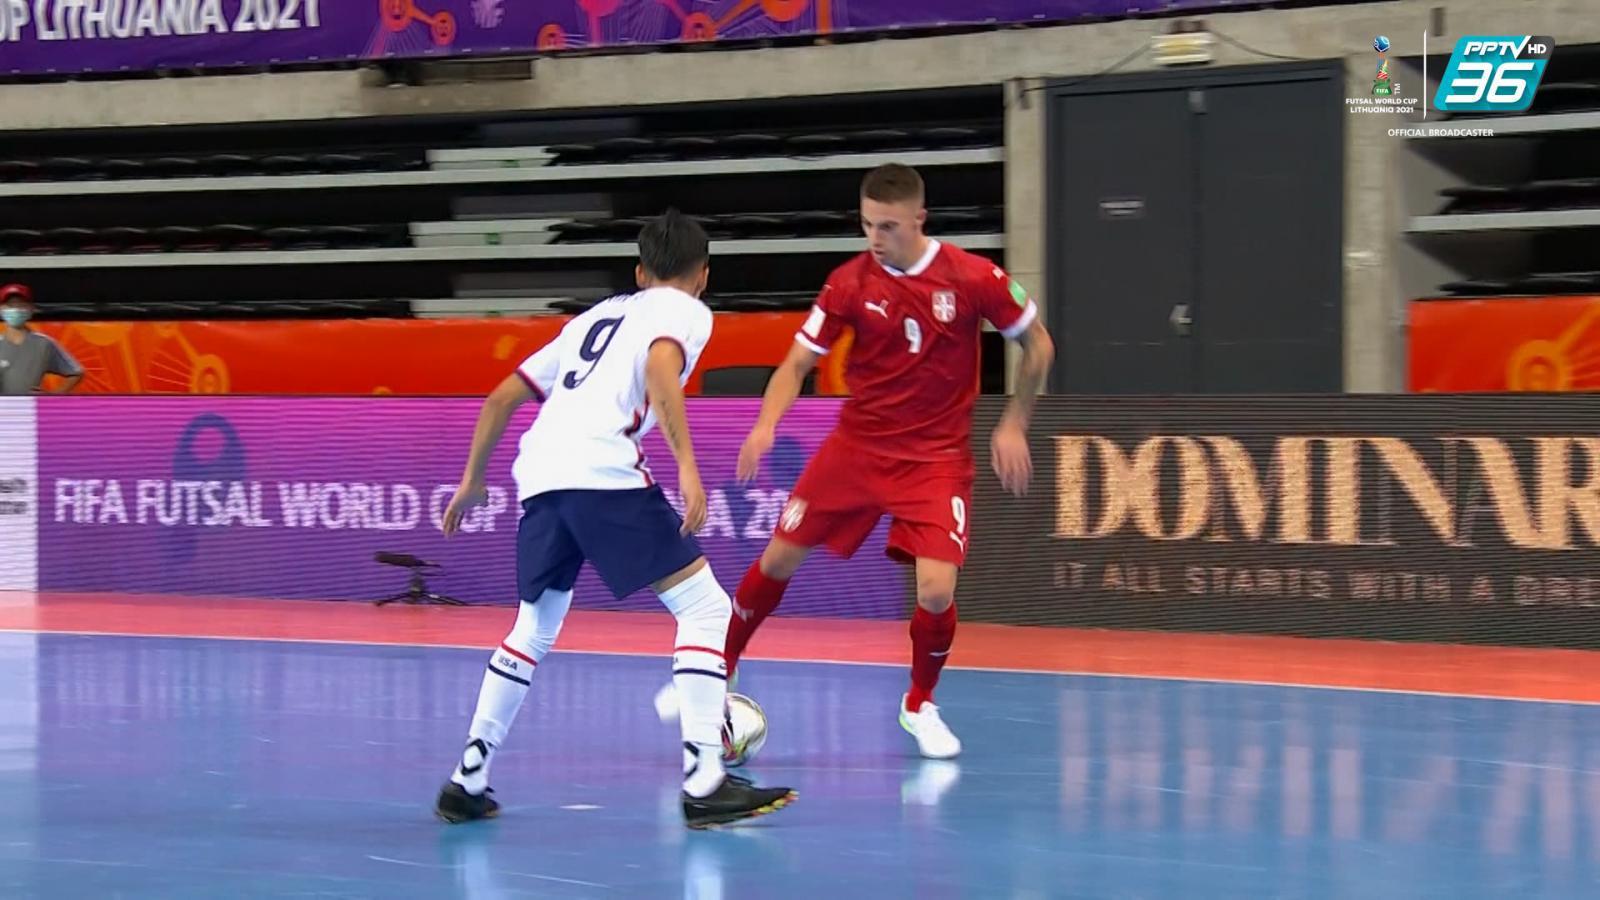 Full Match | ฟีฟ่า ฟุตซอล เวิลด์ คัพ 2021 |  สหรัฐอเมริกา พบ เซอร์เบีย | 20 ก.ย. 64